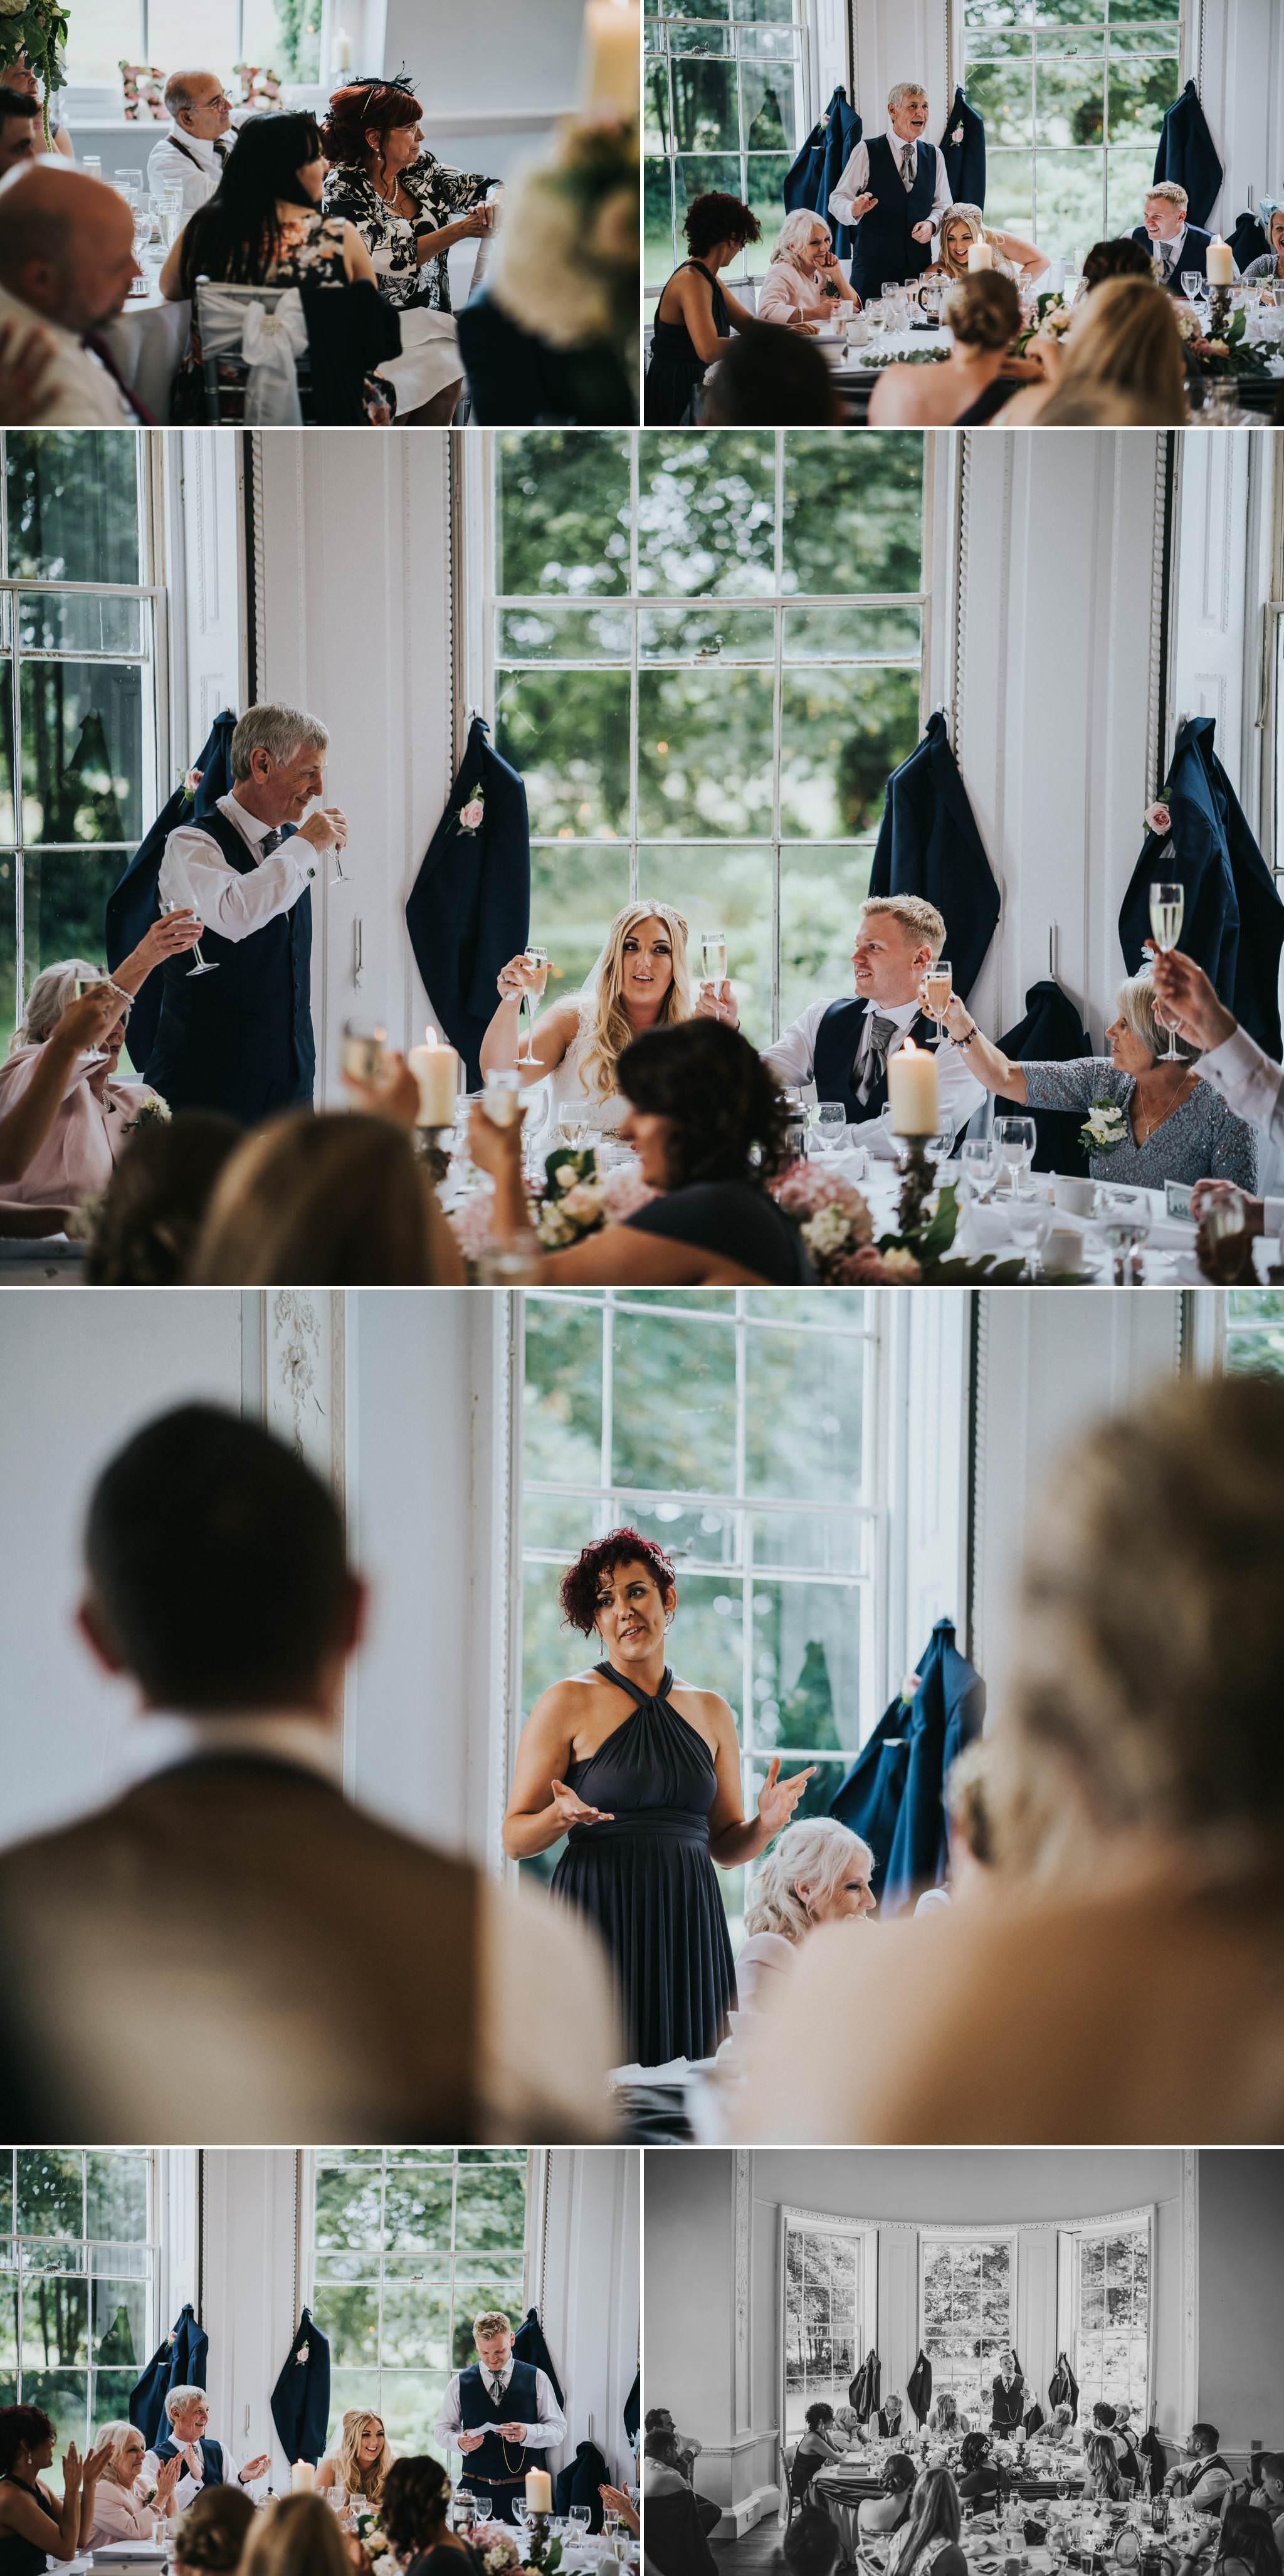 somerford-hall-wedding-photography 15.jpg